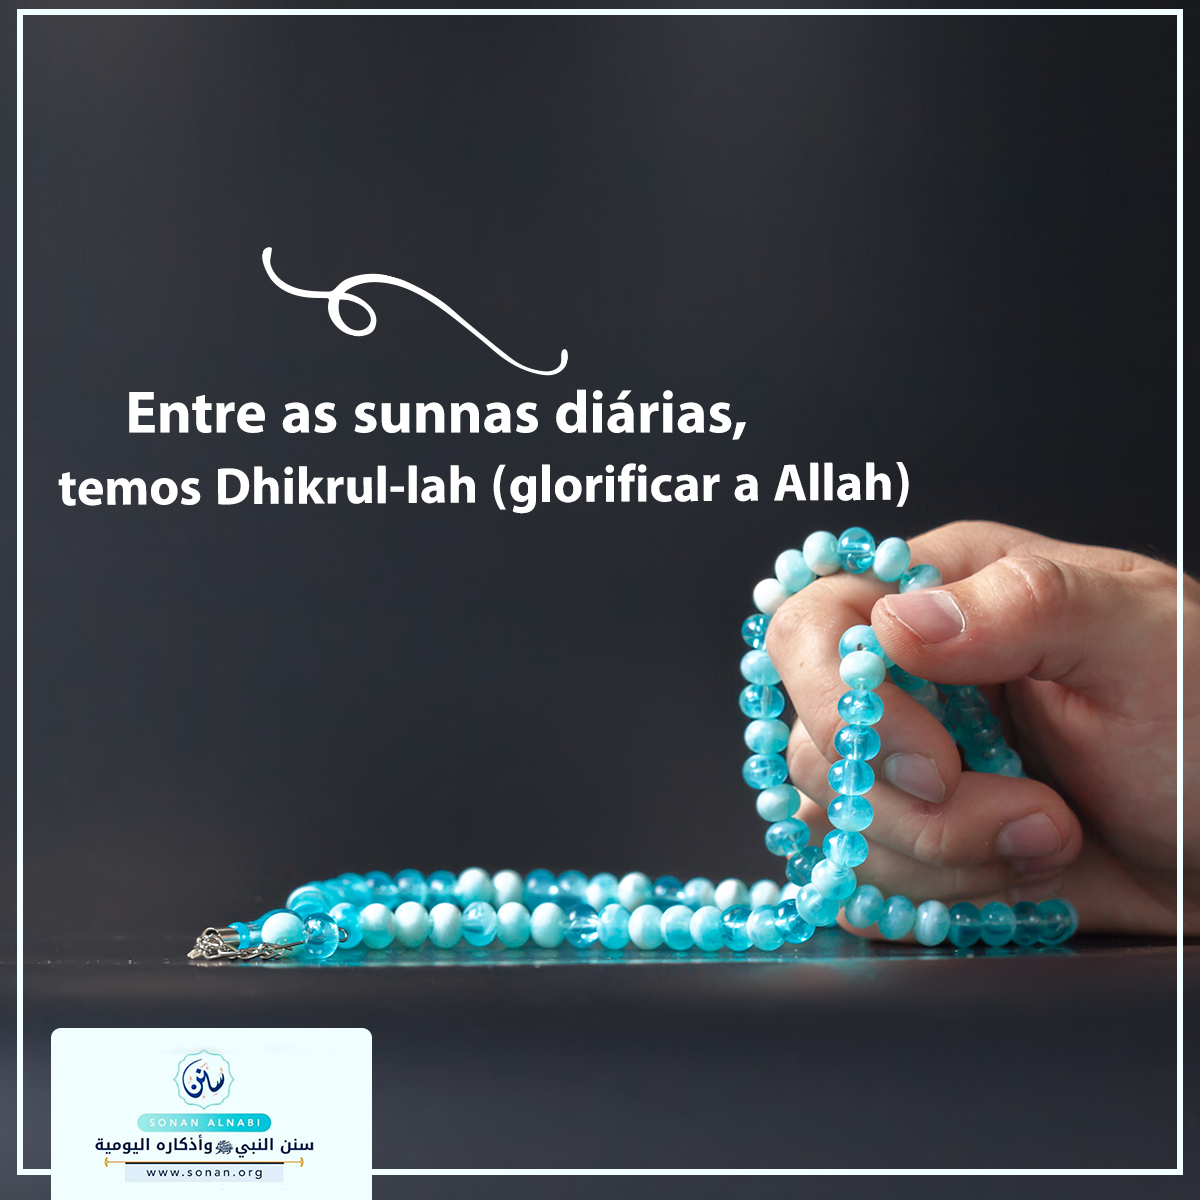 Entre as sunnas diárias, temos Dhikrul-lah (glorificar a Allah).